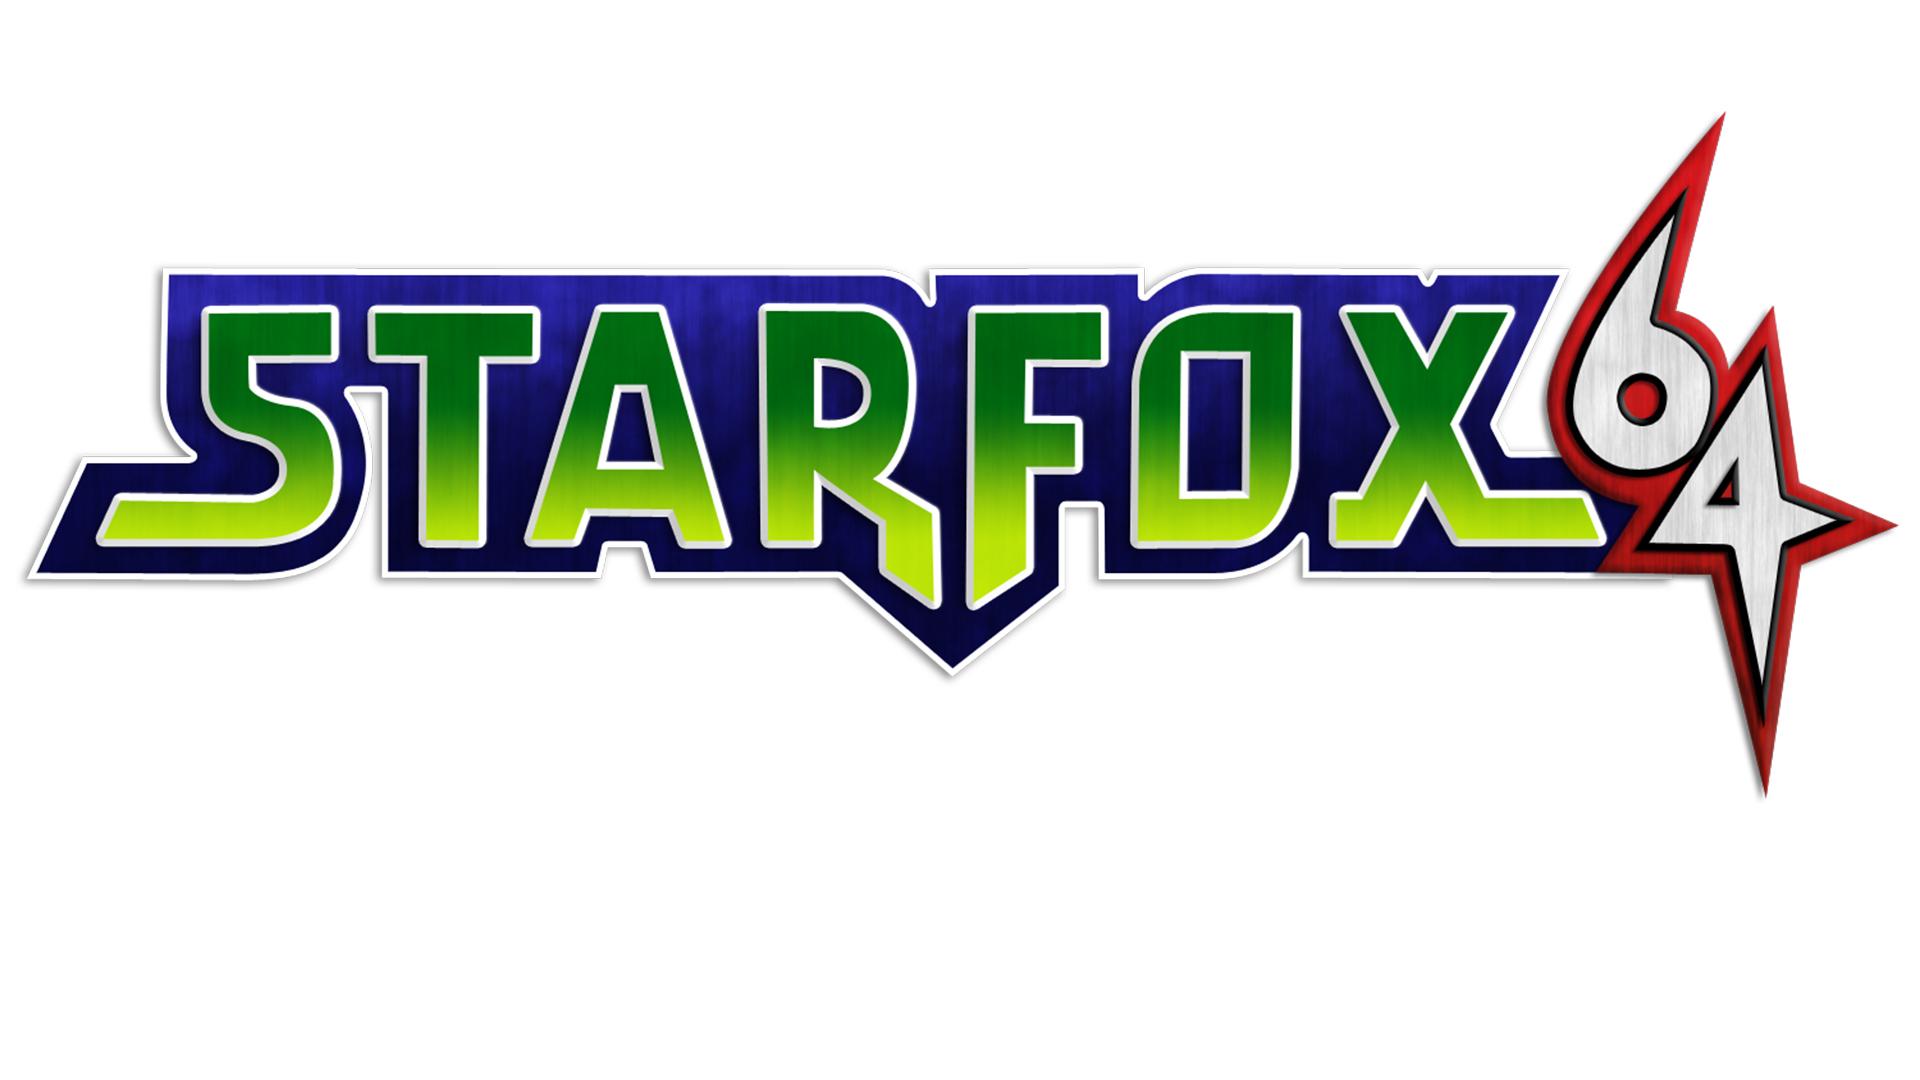 All Clear - Star Fox 64